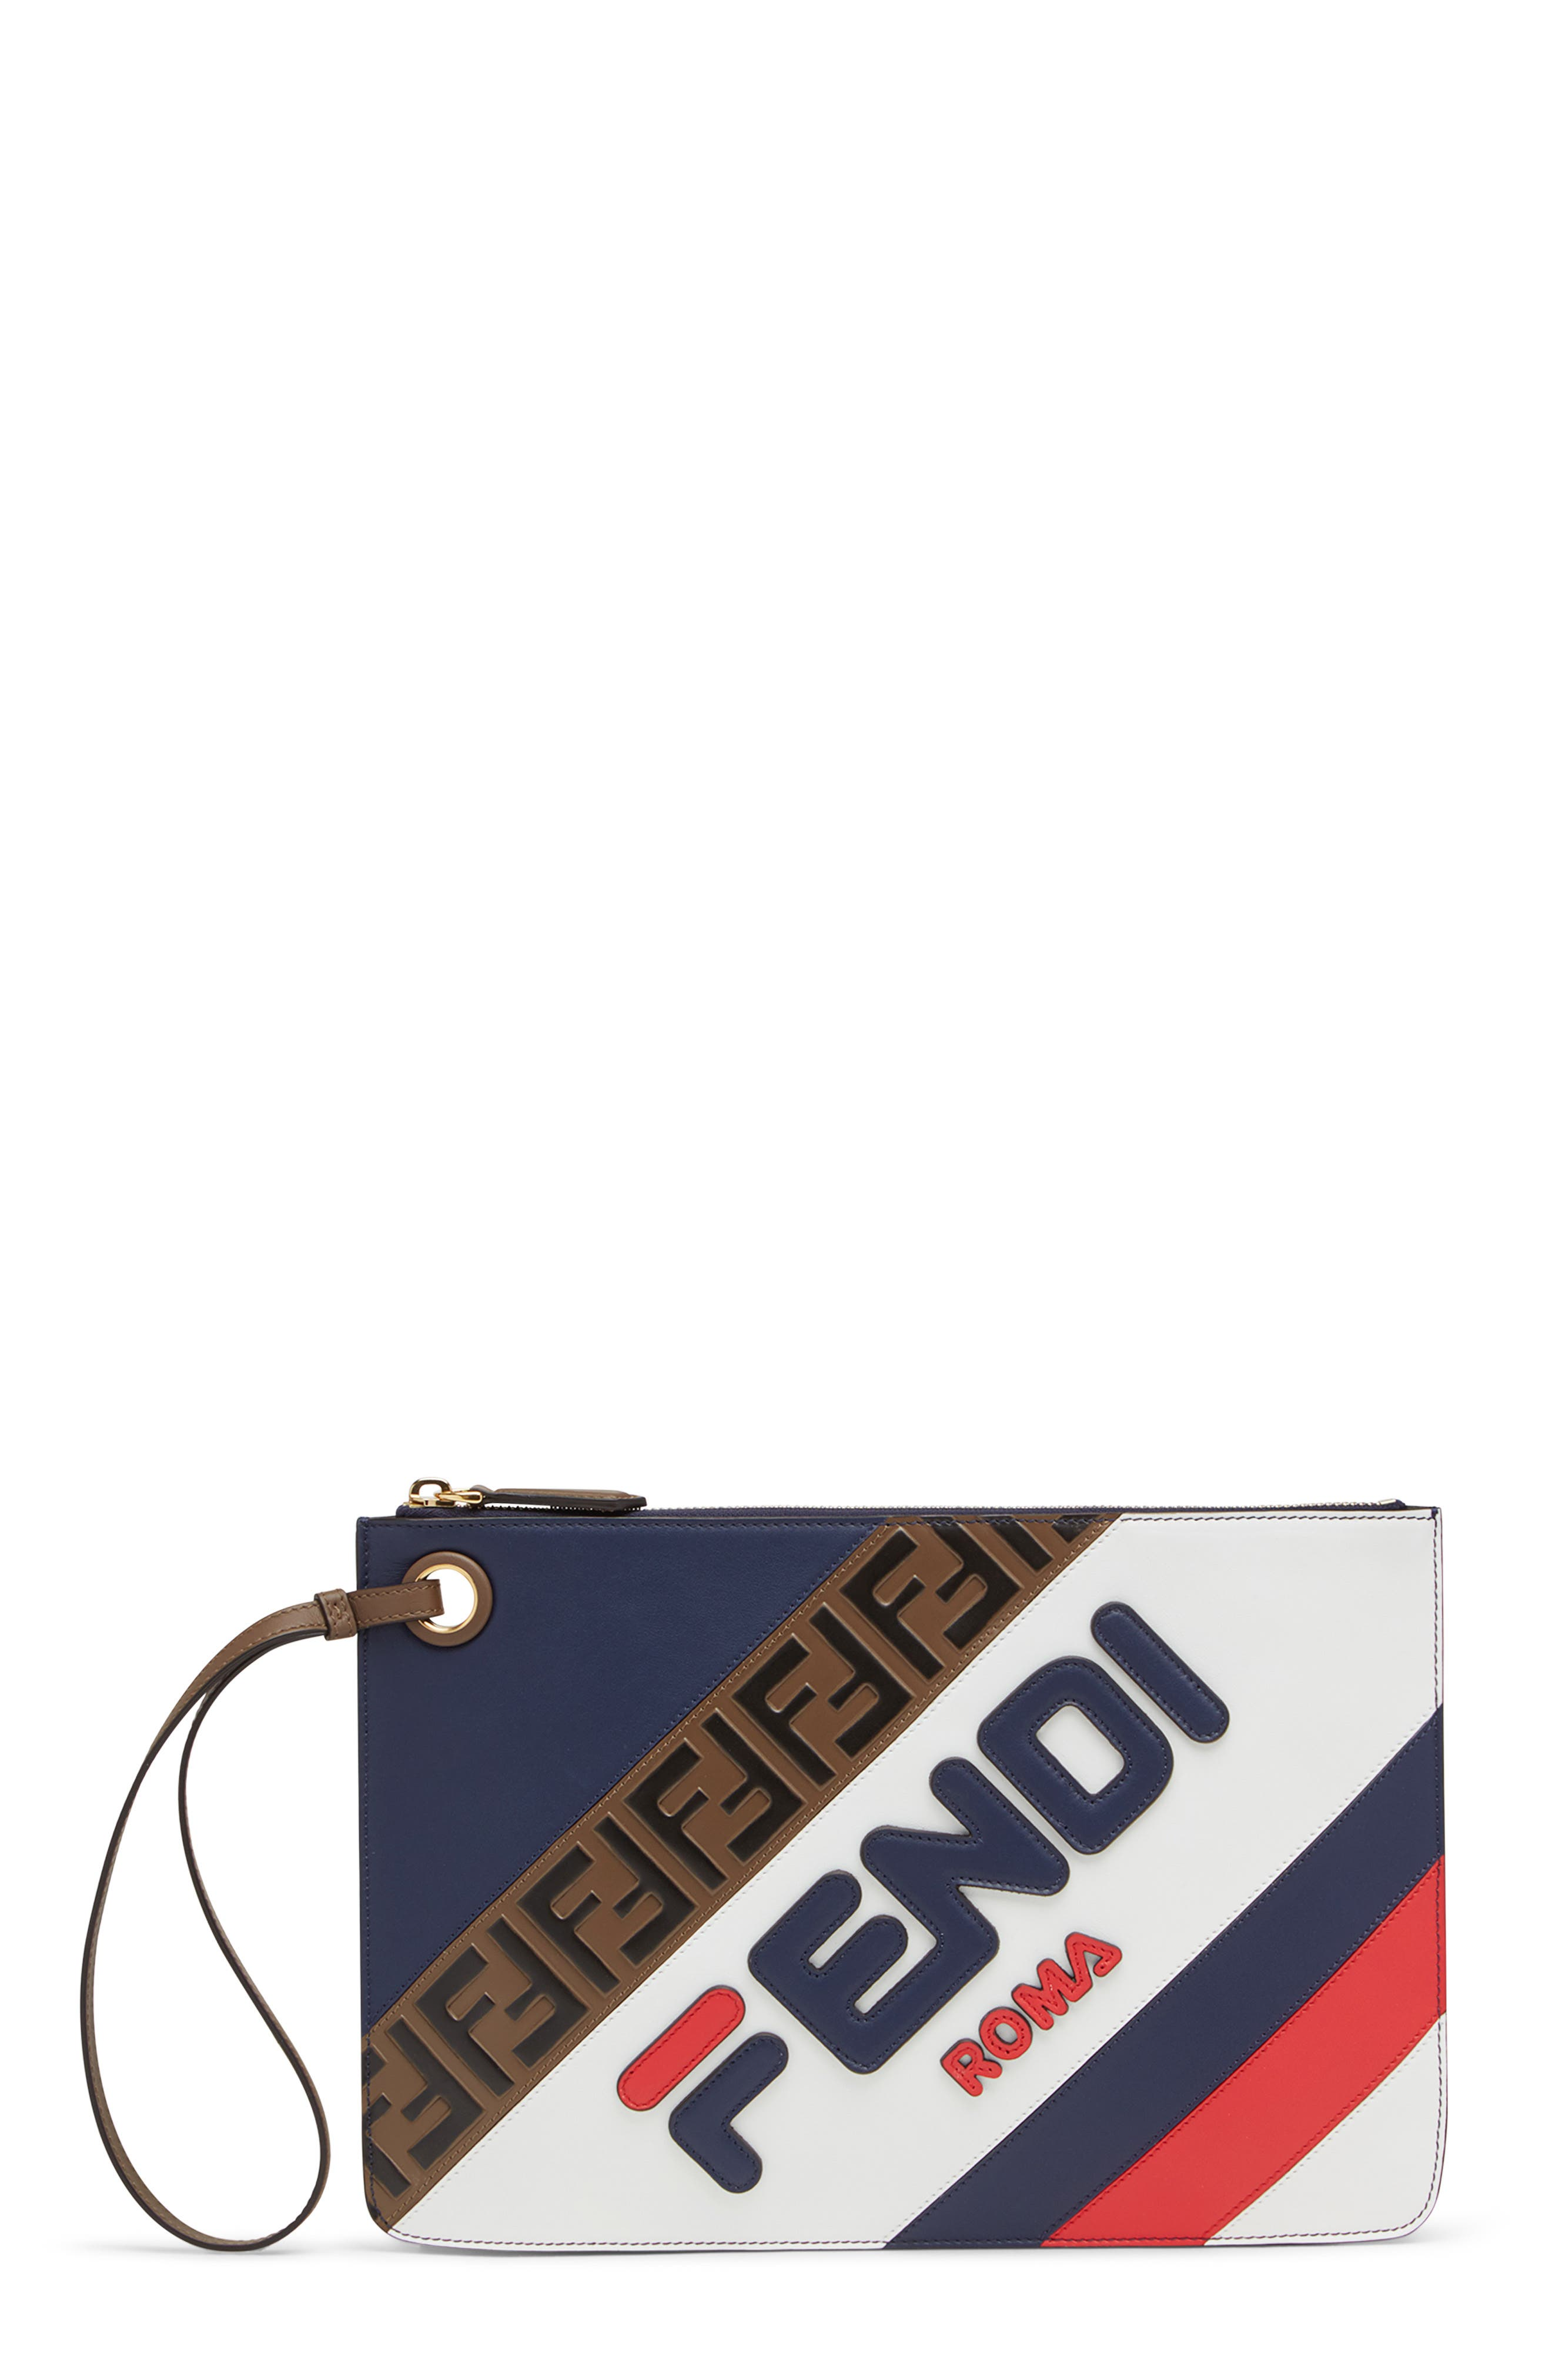 x FILA Medium Mania Logo Leather Clutch, Main, color, BLUE/ BERRY MULTI